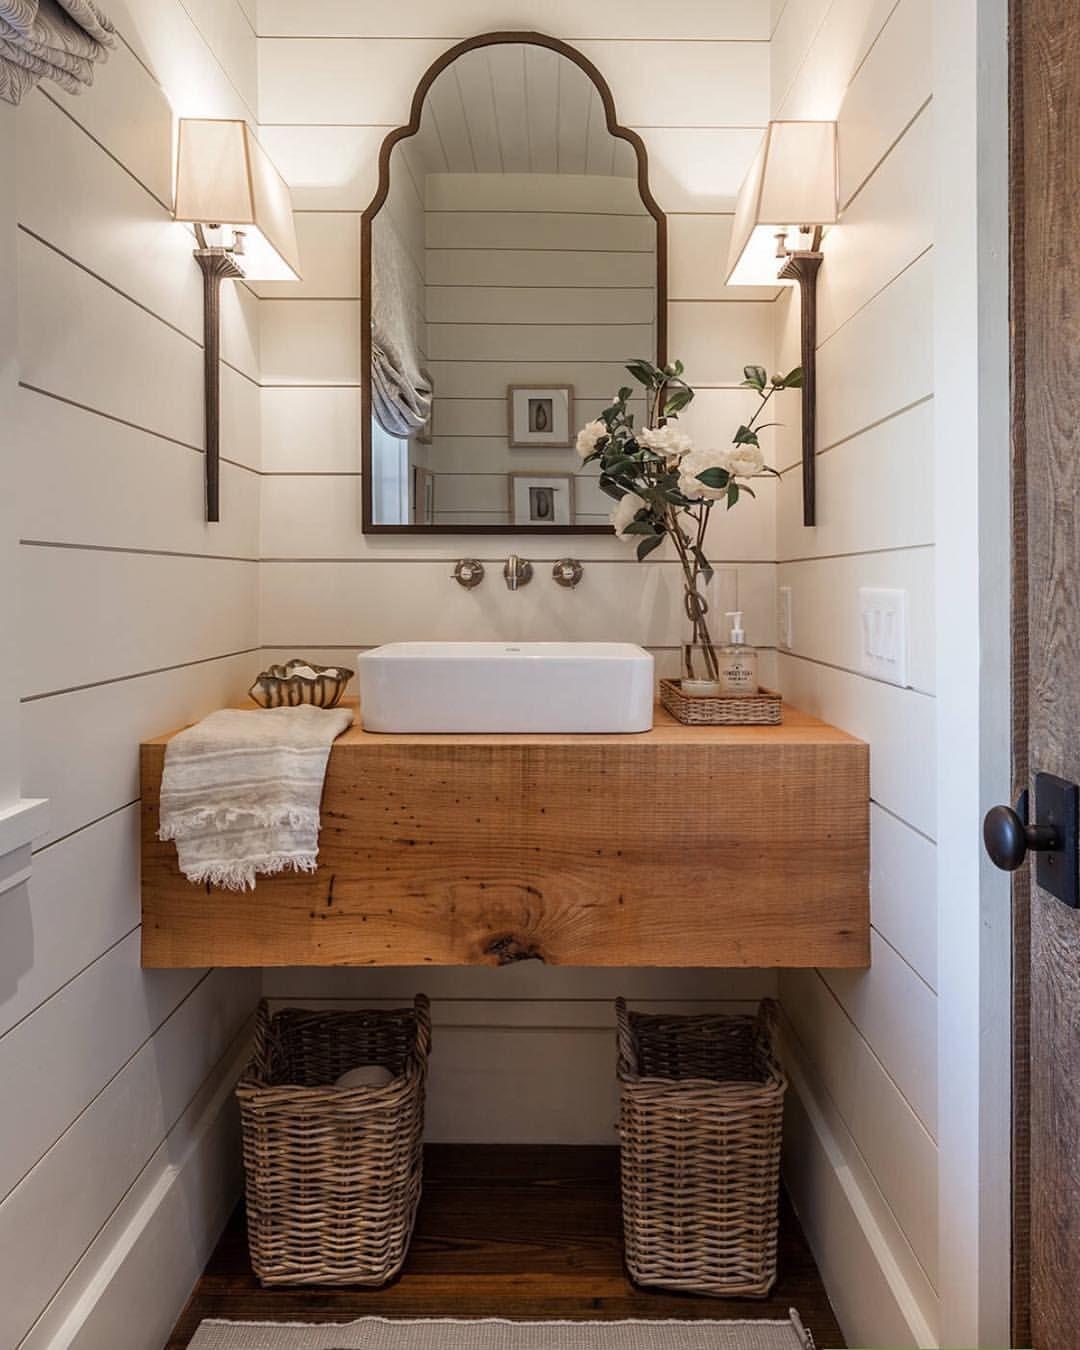 Mirror Design For Bathroom Captivating 17 Bathroom Mirrors Ideas  Decor & Design Inspirations For Design Ideas